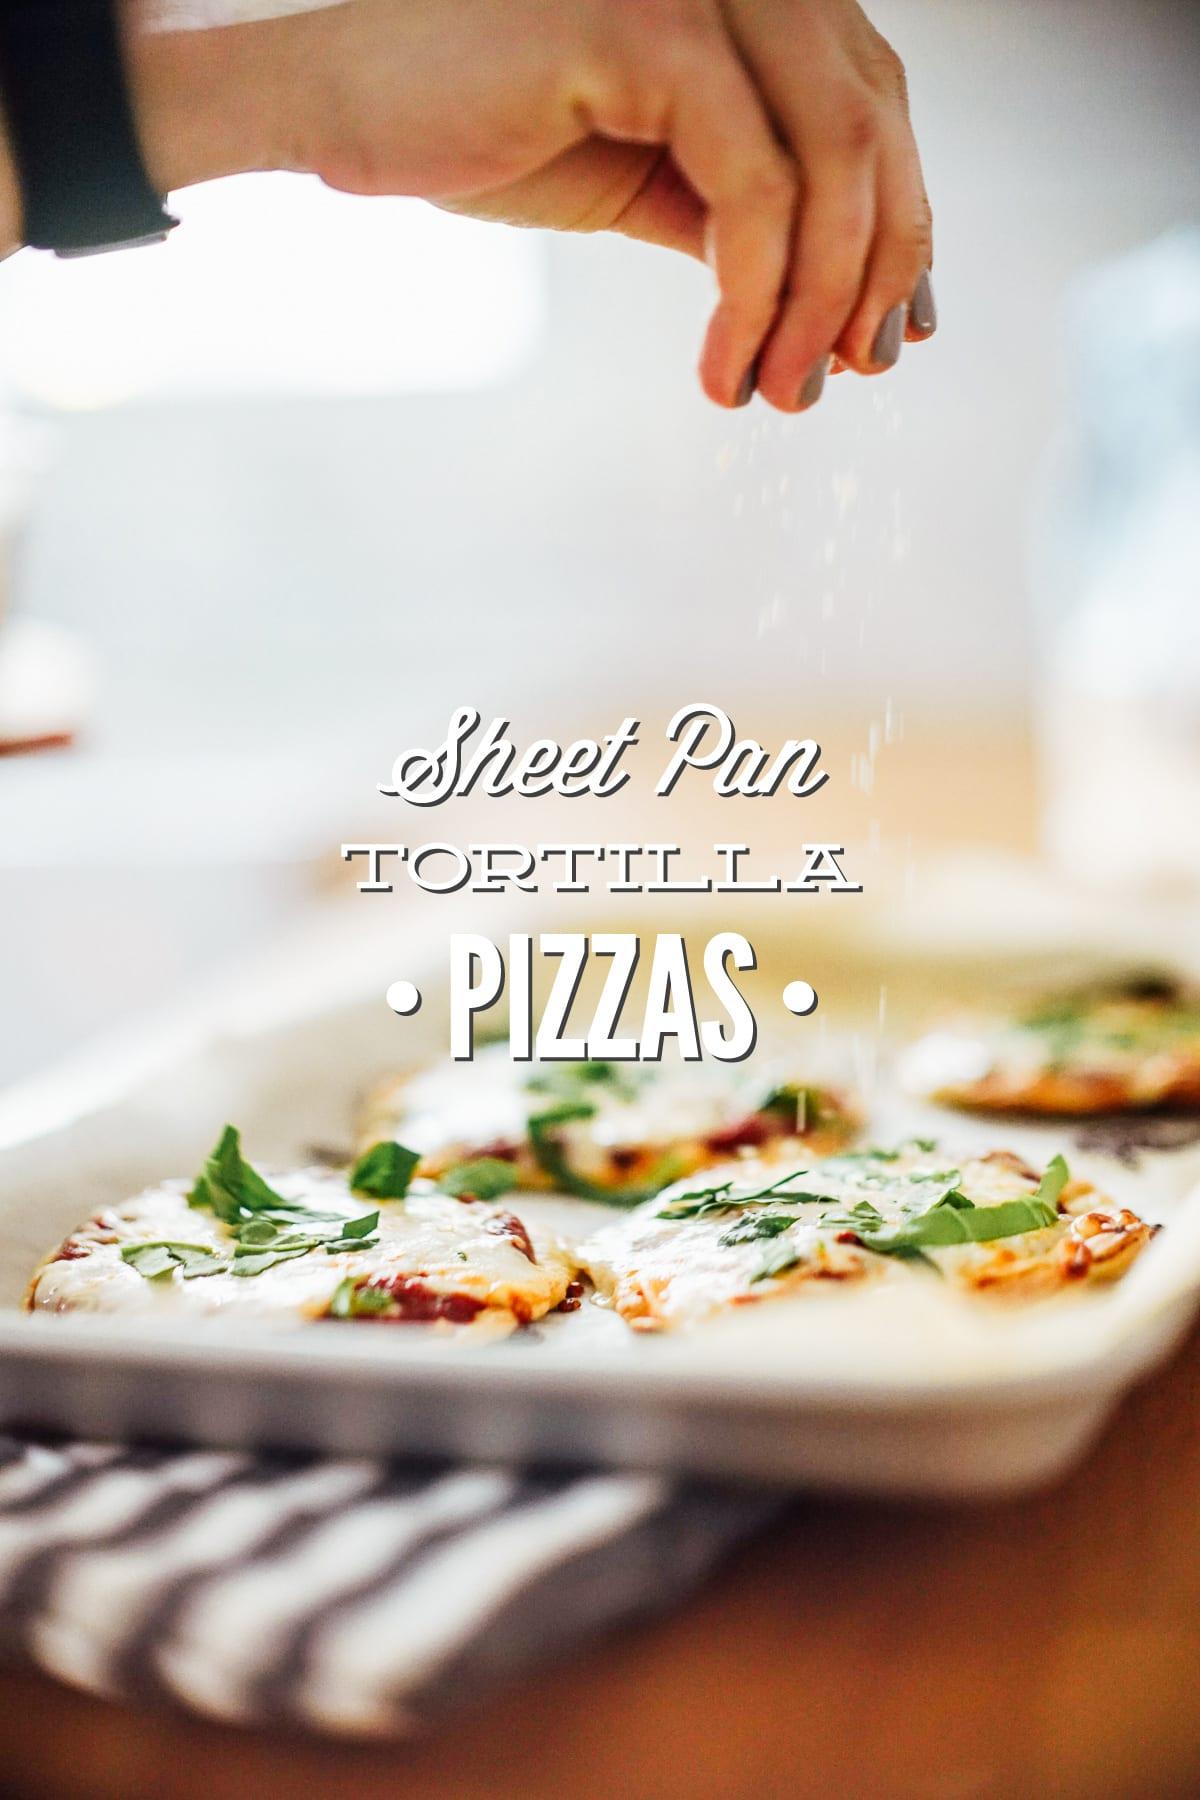 Sheet Pan Tortilla Pizzas